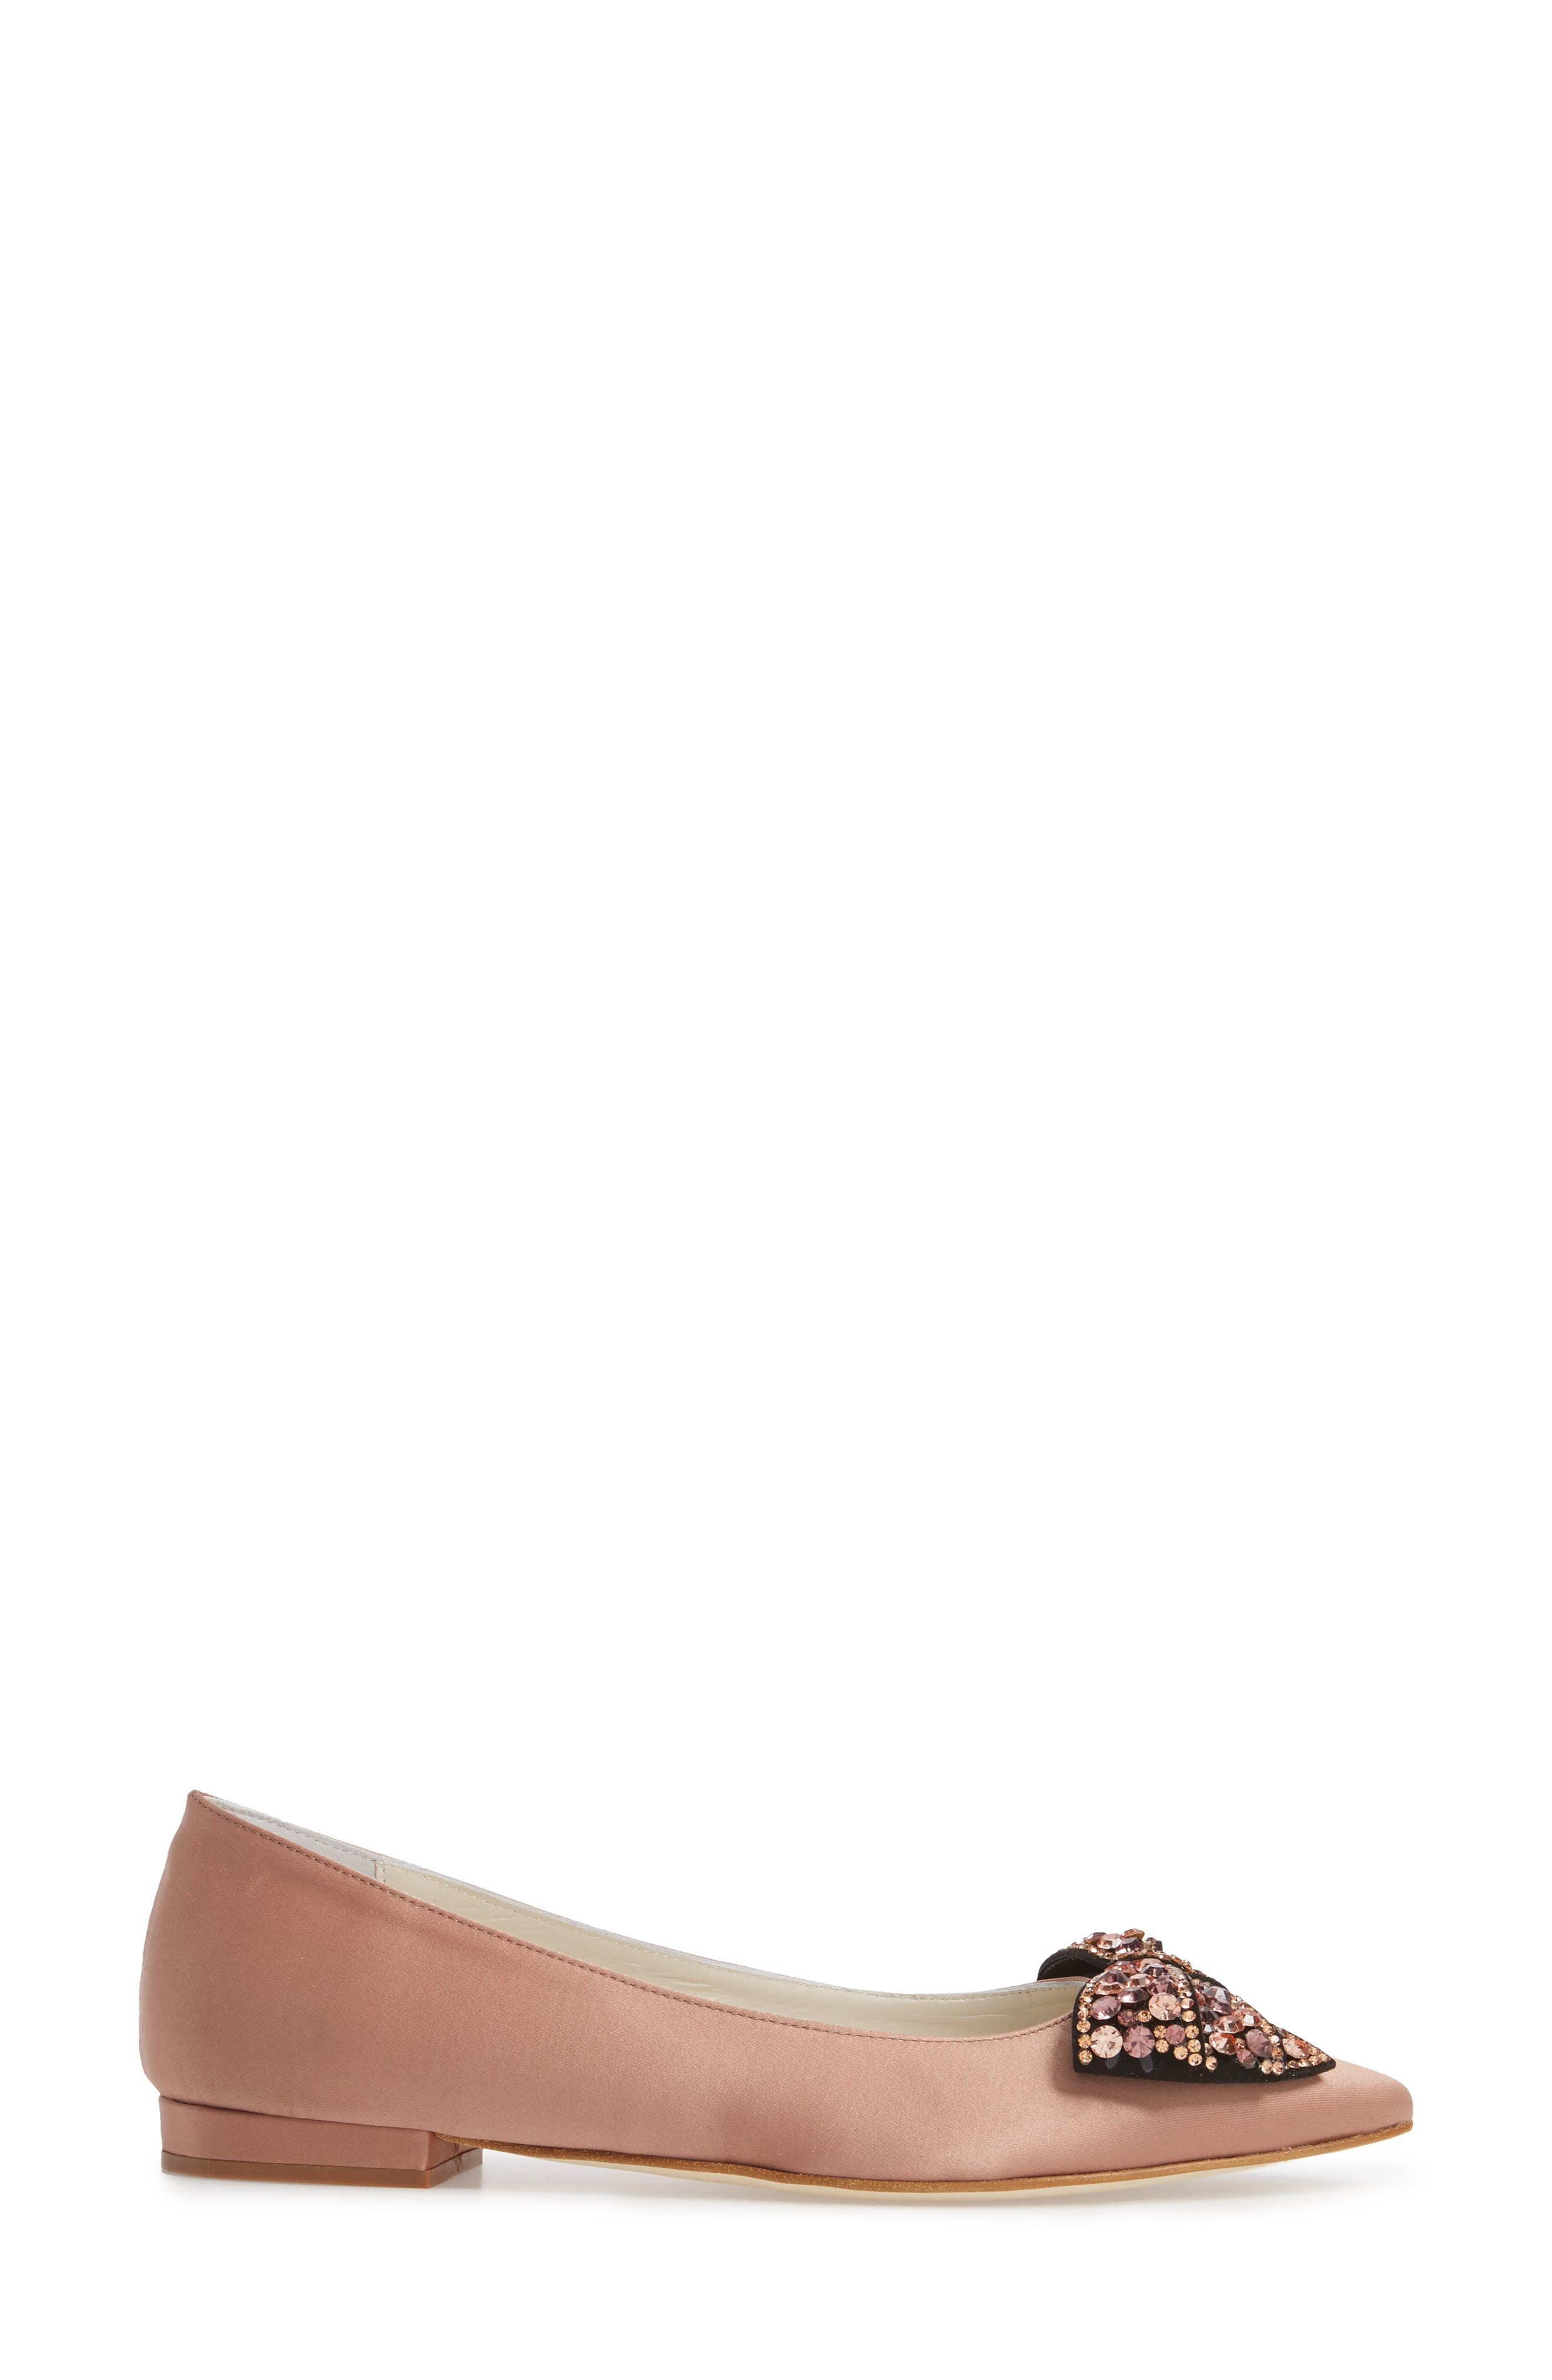 Milva Embellished Bow Pointy Toe Flat,                             Alternate thumbnail 3, color,                             Blush Satin